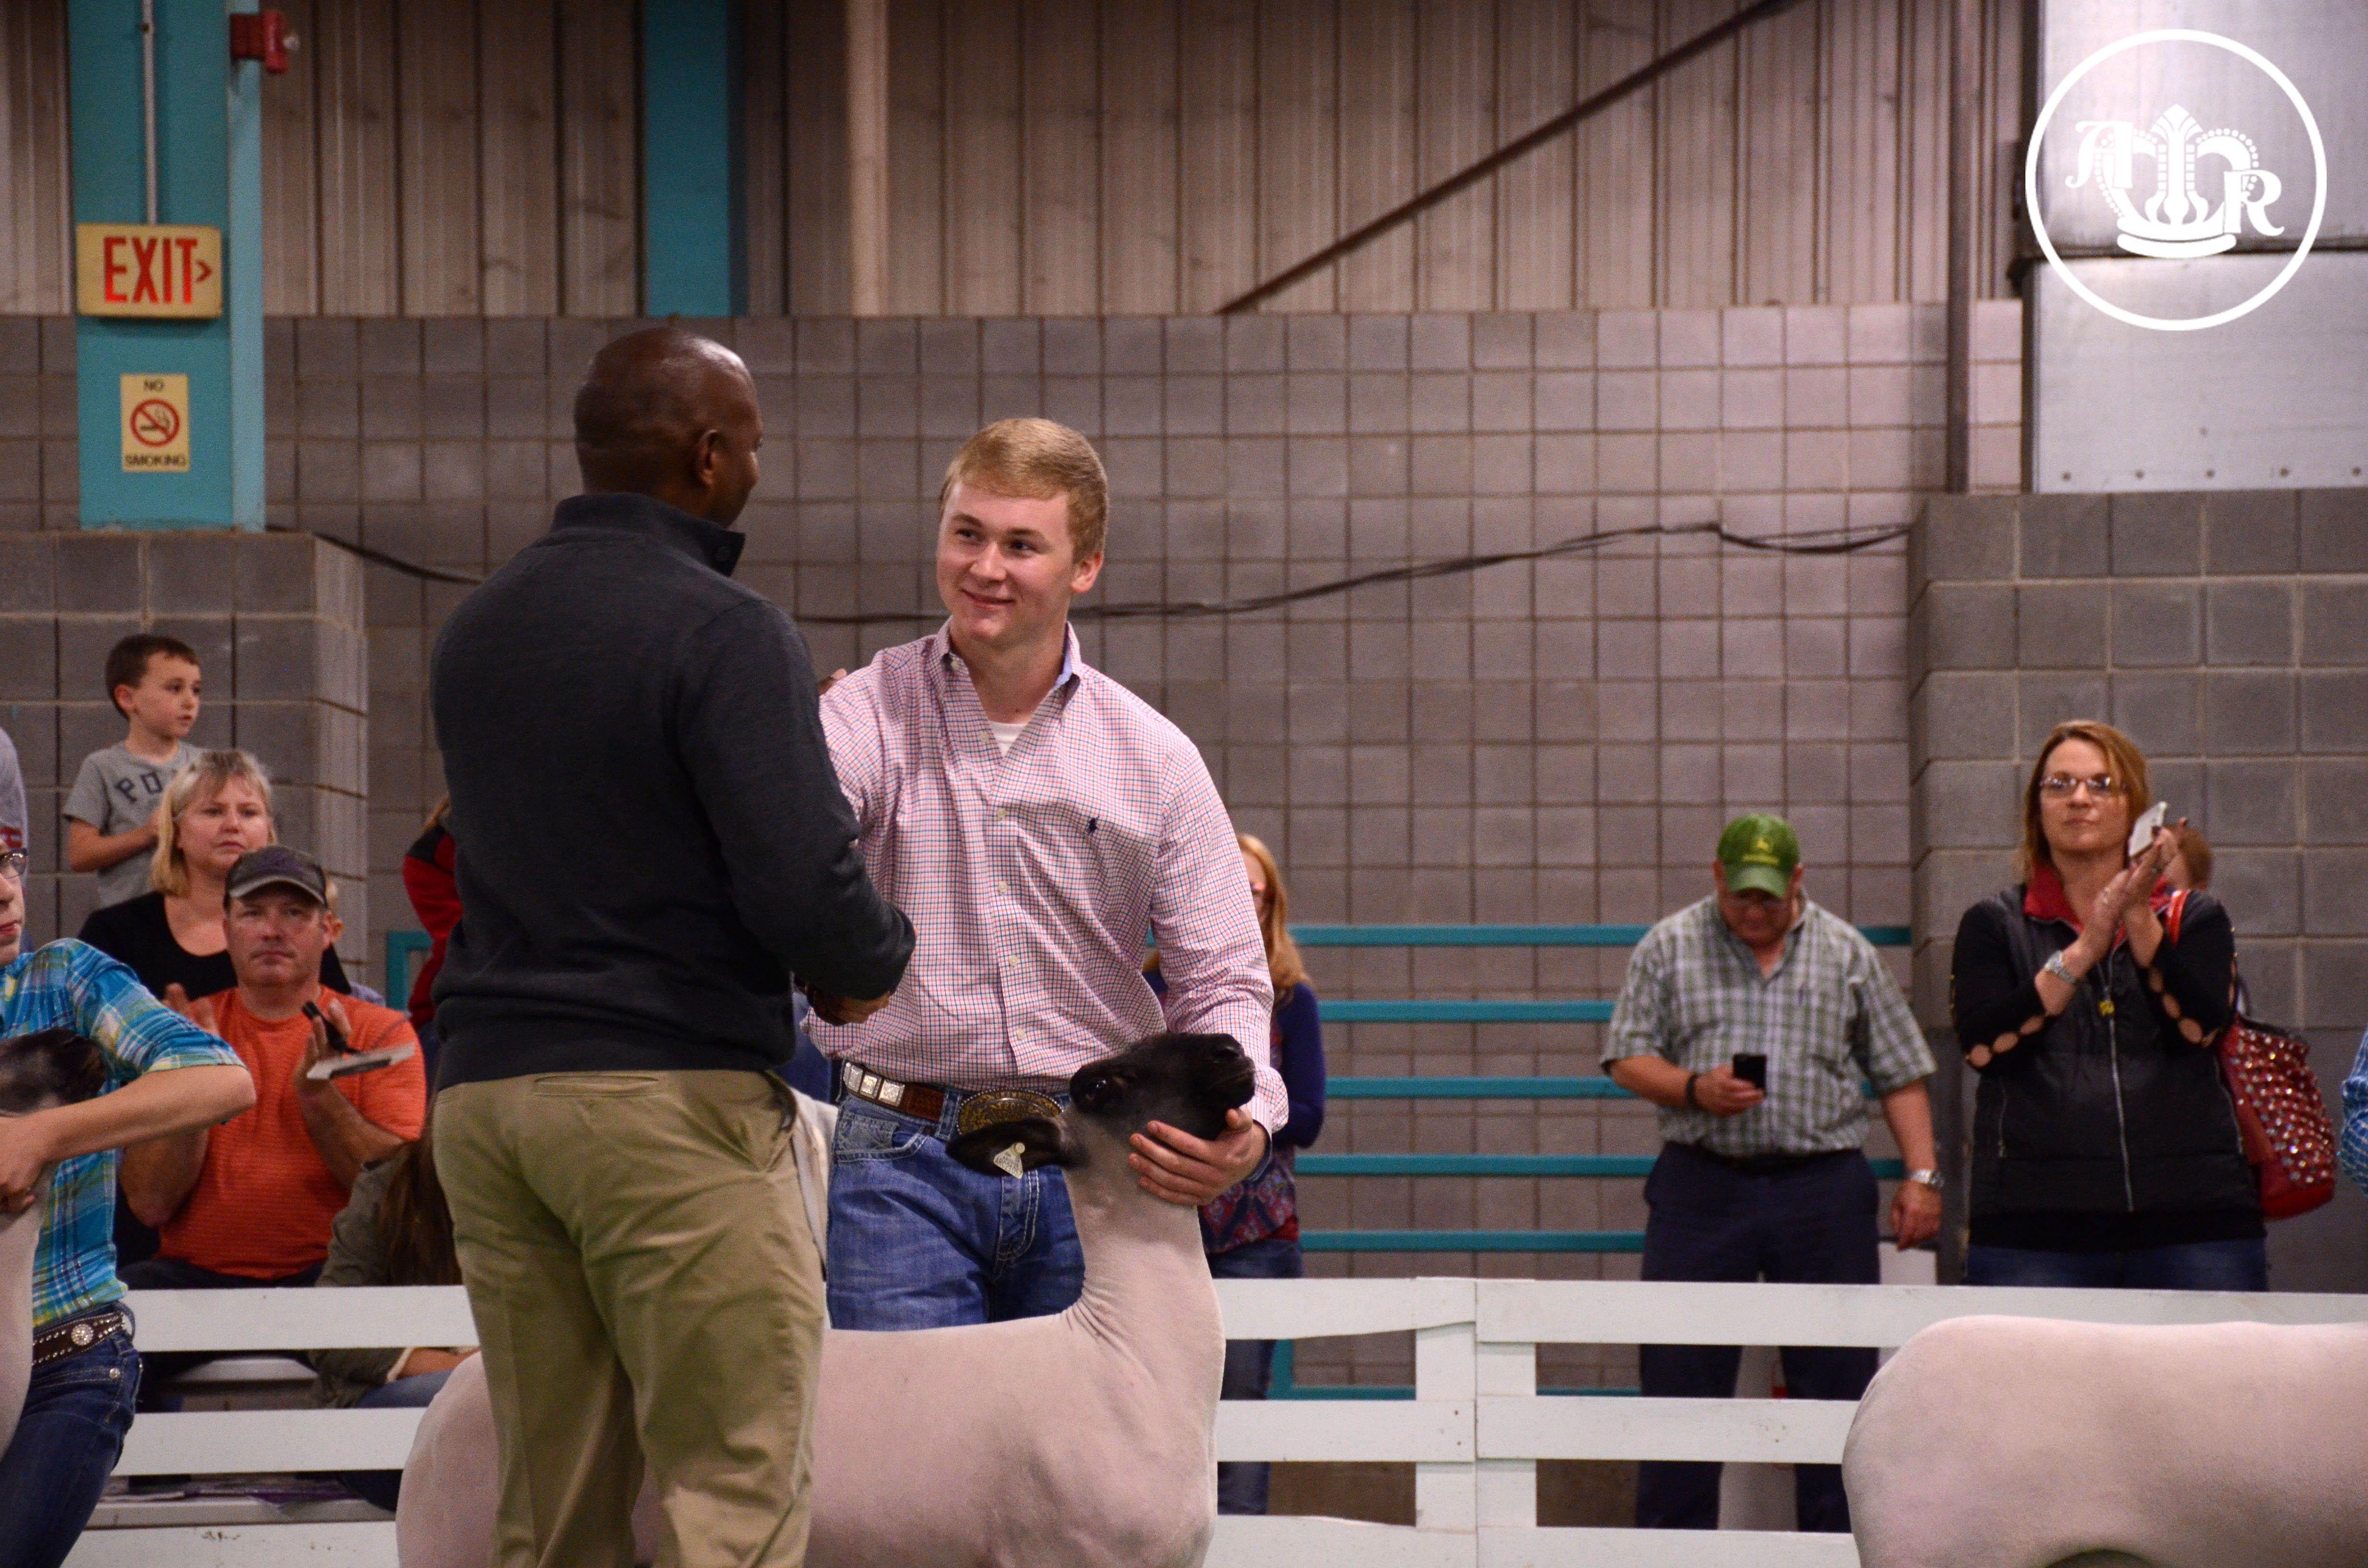 Harlow Named Top Market Lamb Showman